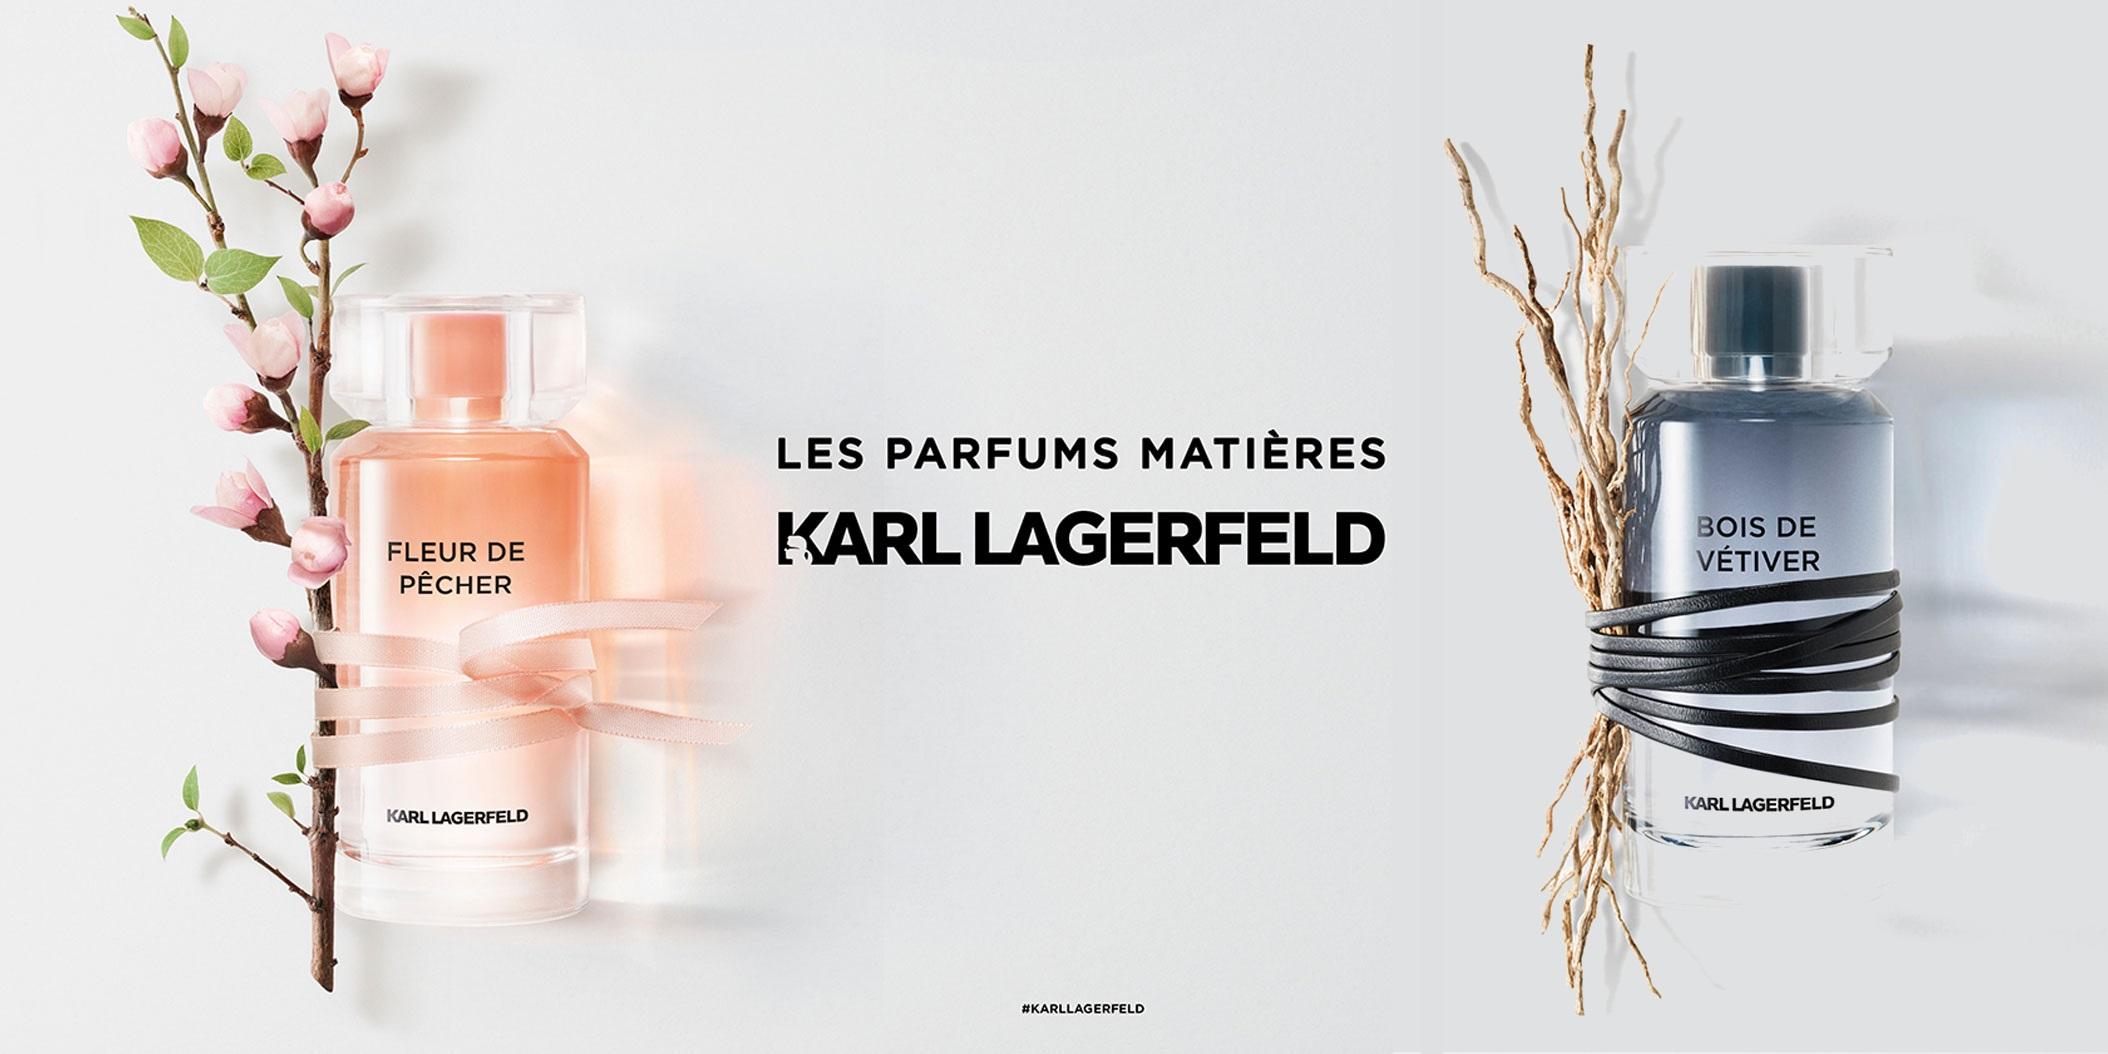 parfums matieres fleur de pecher bois de vetiver_karl lagerfeld